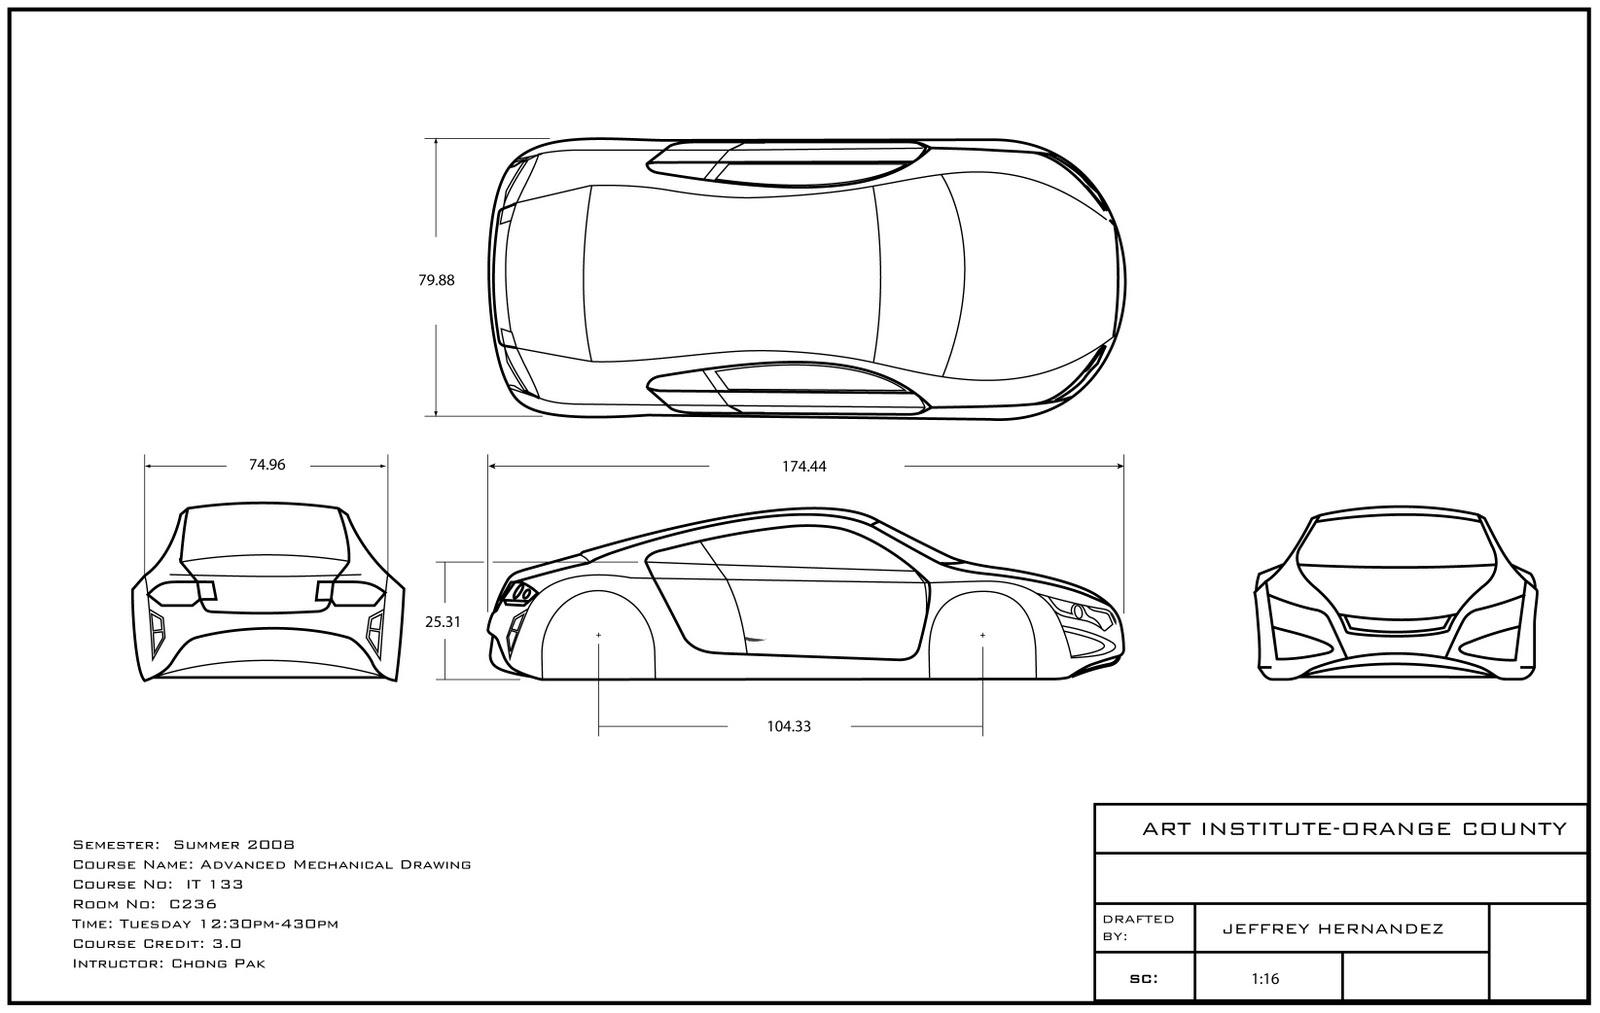 Design of car model - Kique Design Draft Drawing For A Scale Car Model